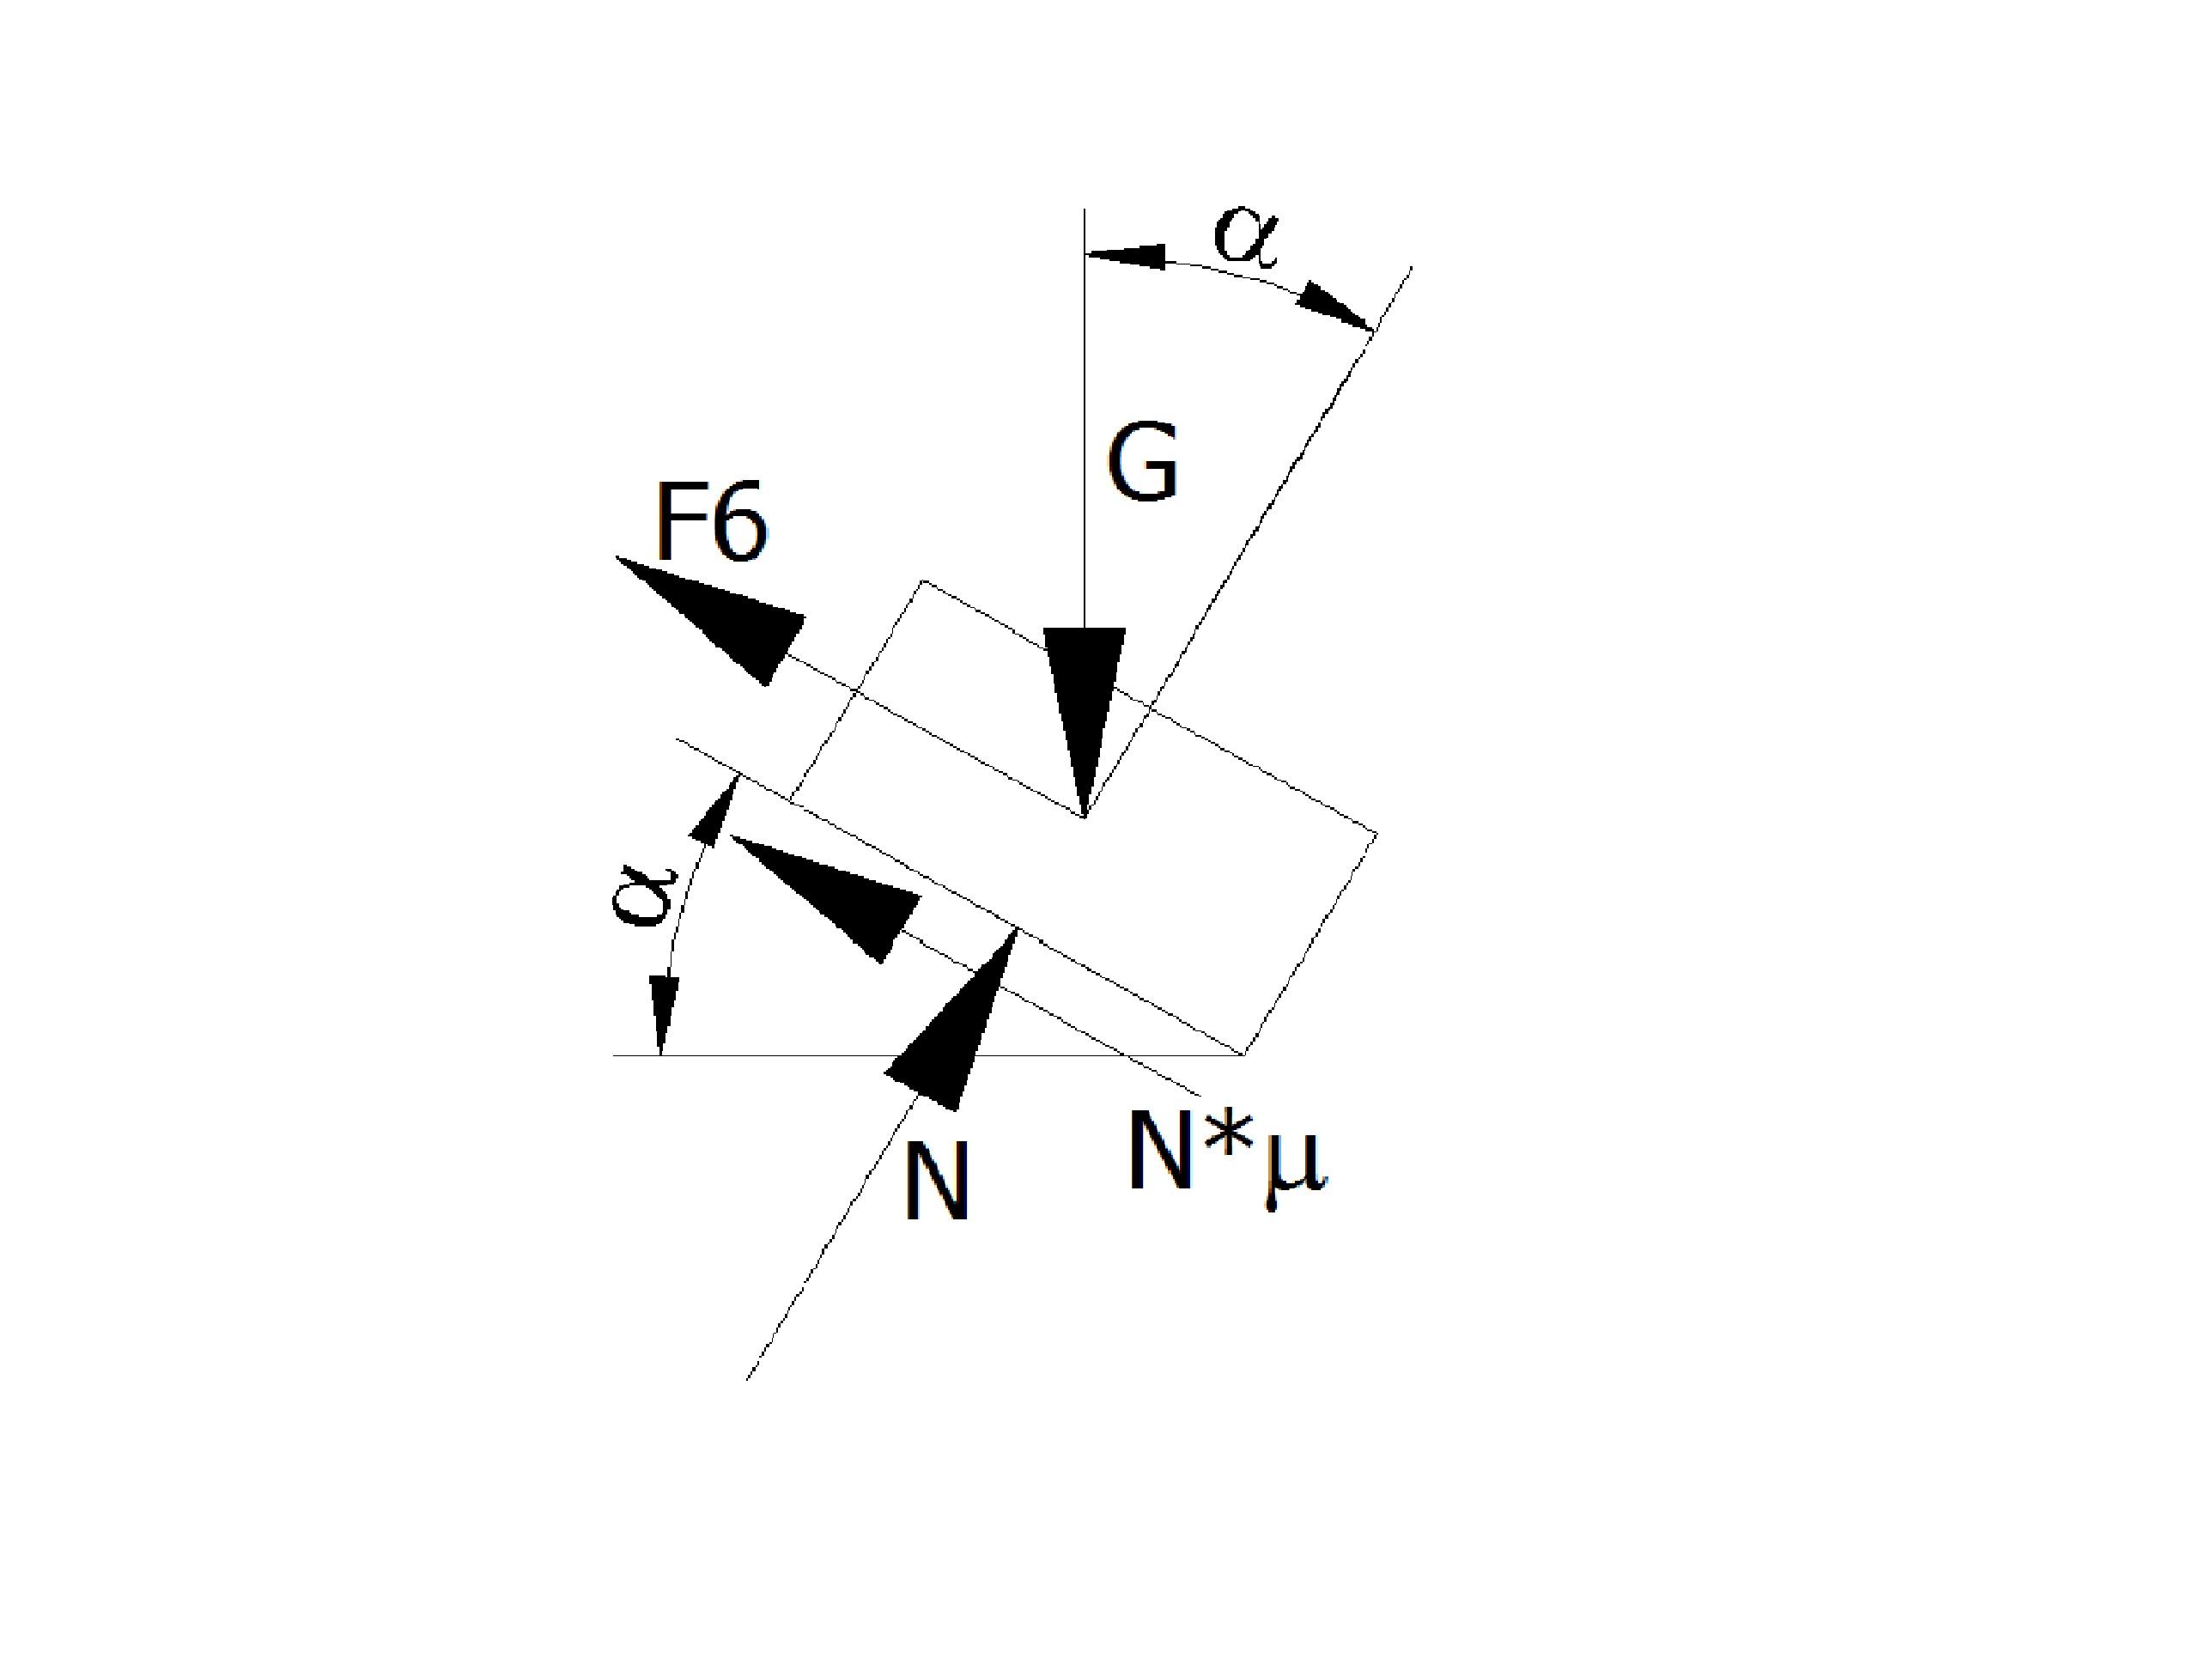 statyka2 - Statyka - ściąga